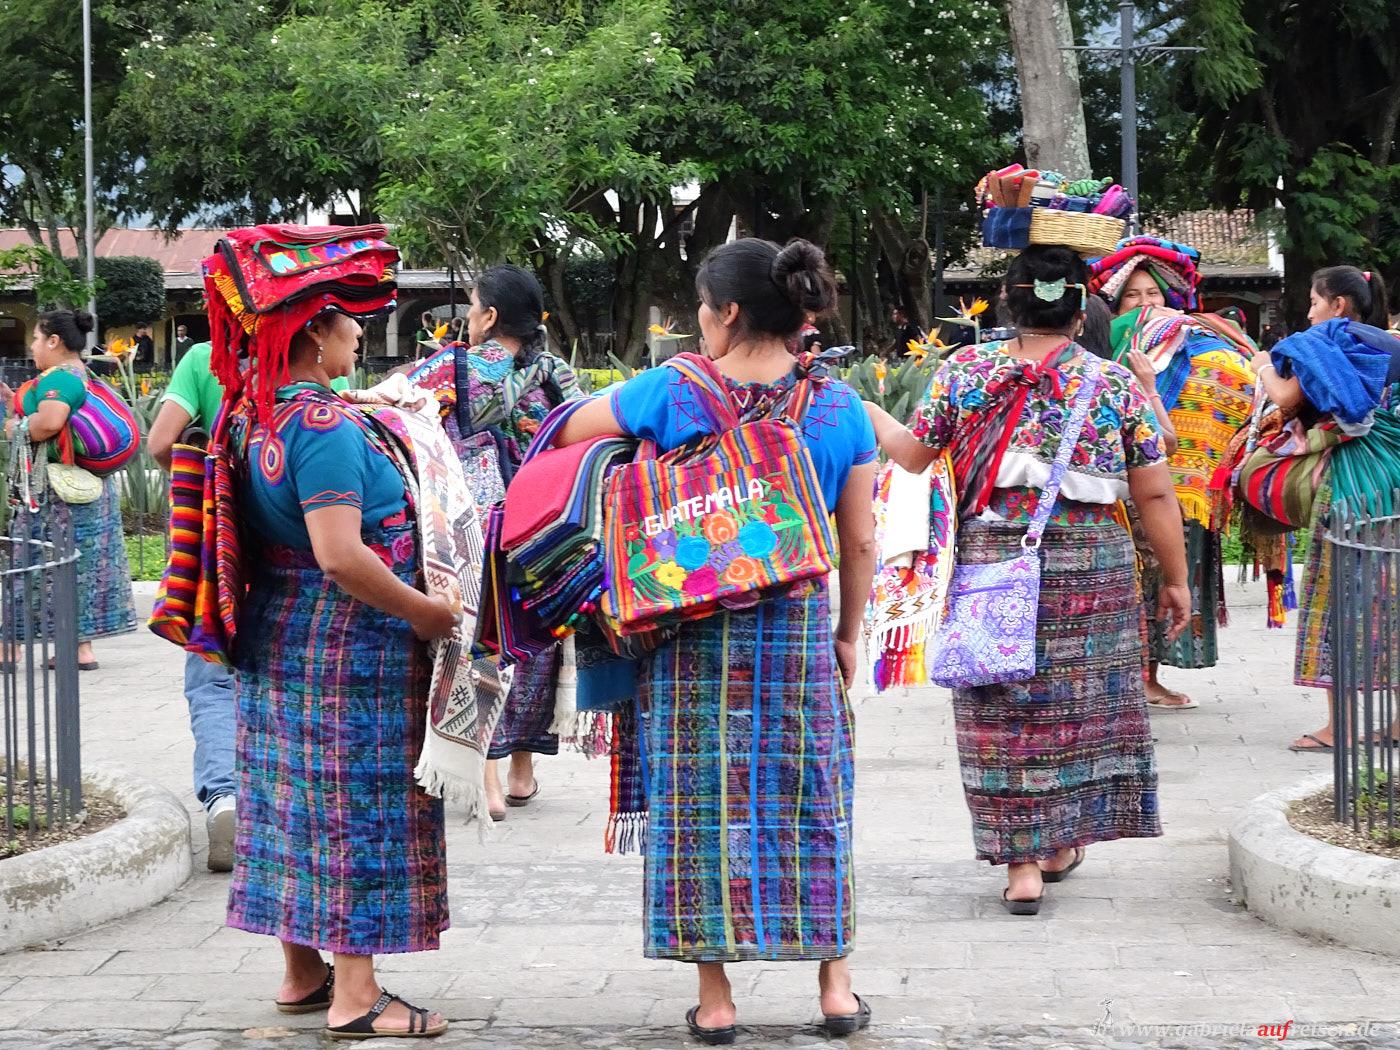 Mayafrauen in Guatemala